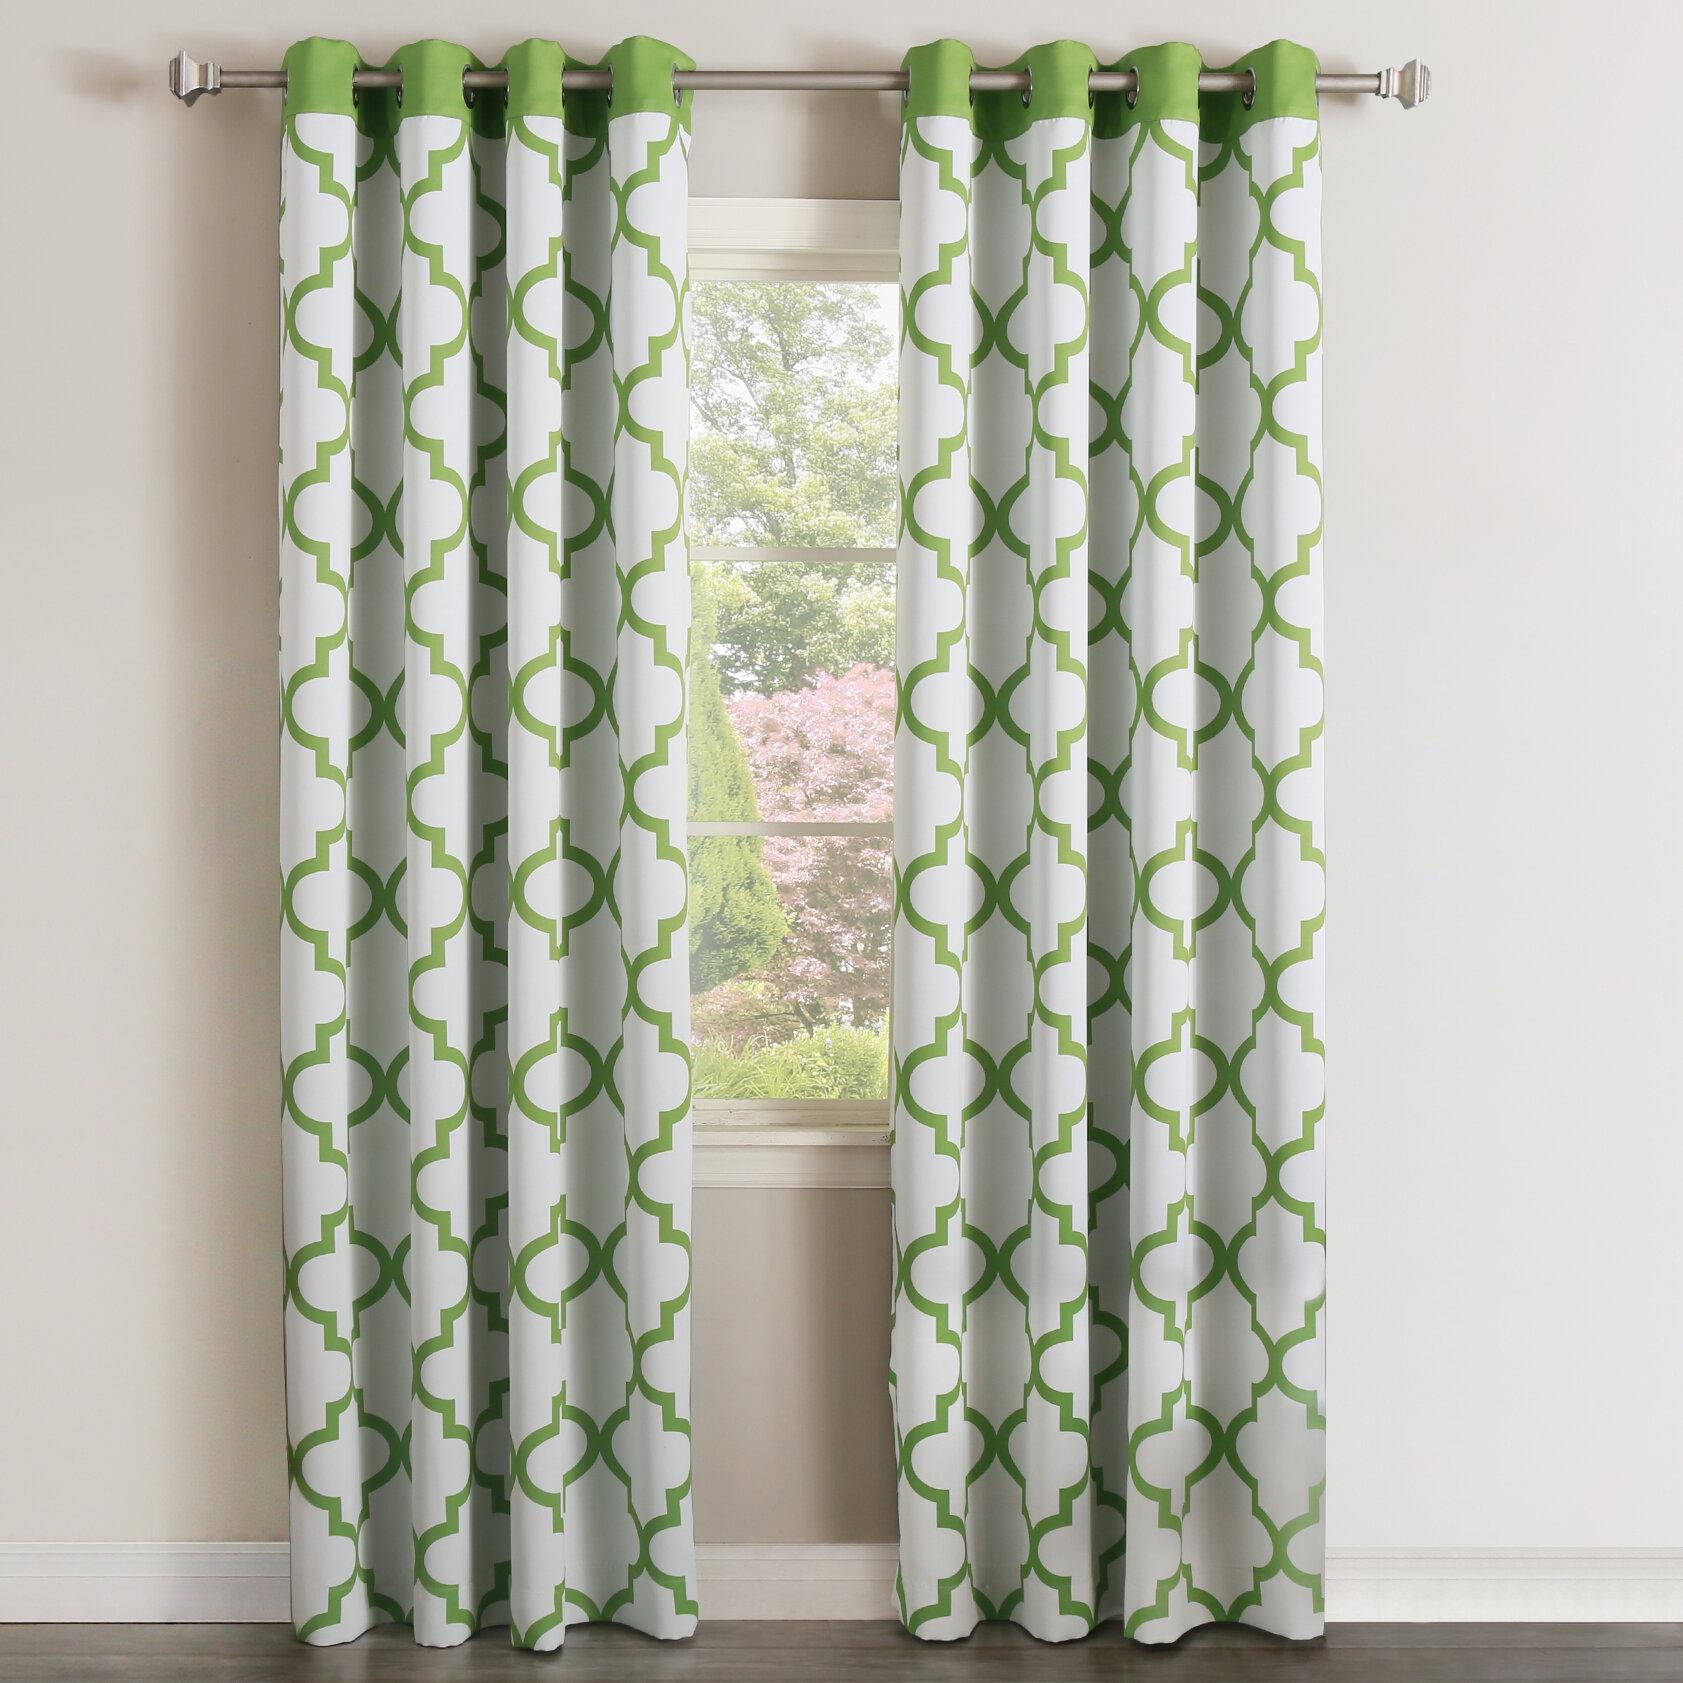 Andrews Geometric Room Darkening Grommet Curtain Panels Reviews Allmodern